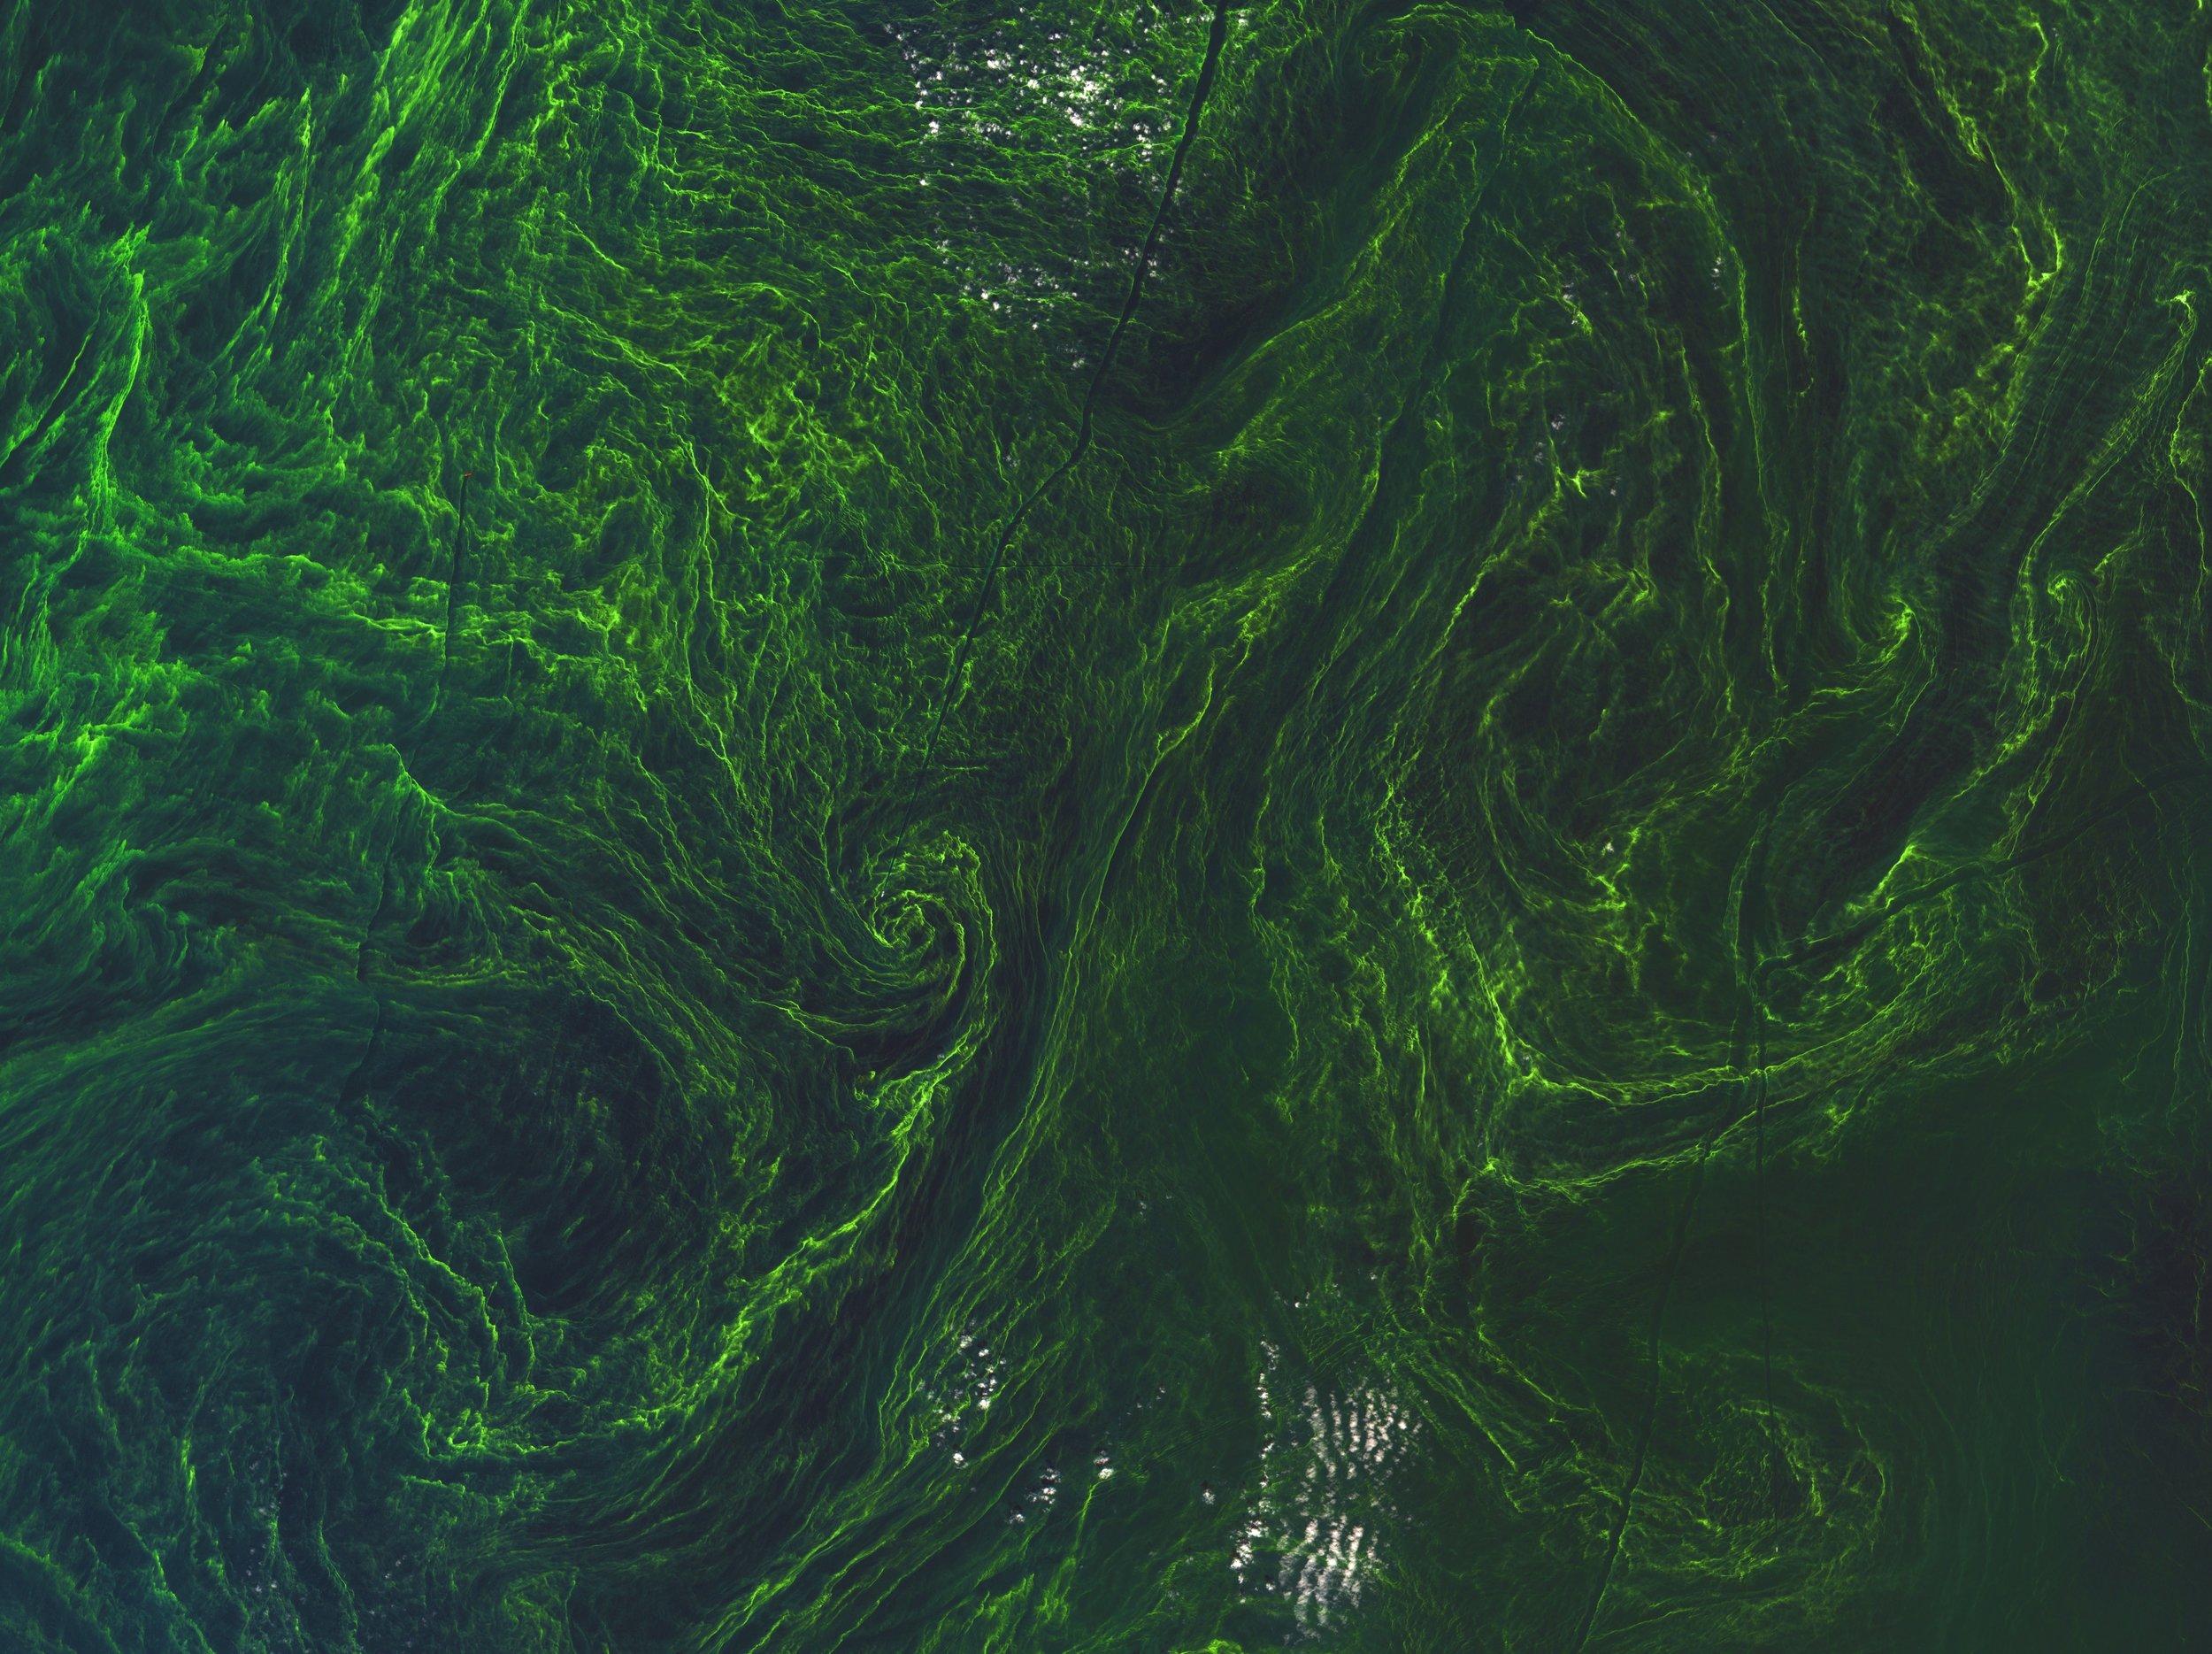 2. Pollution_Algae_bloom_new (1).jpg